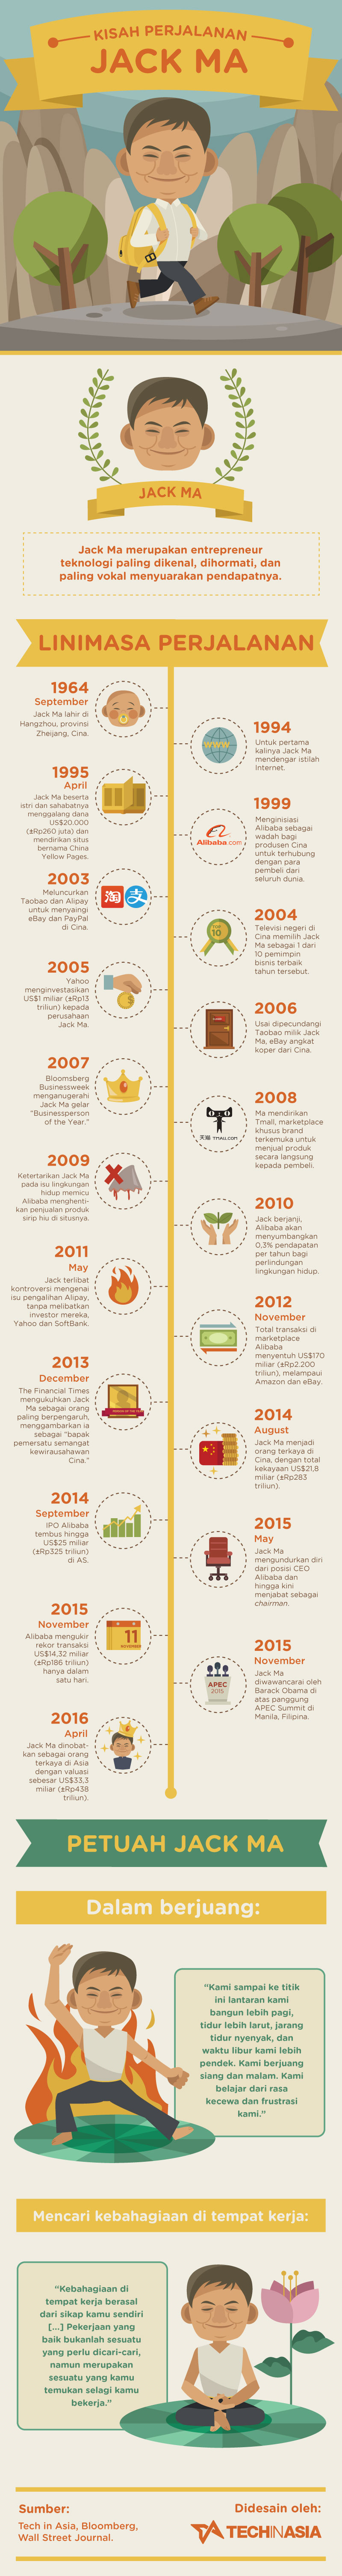 Kisah perjalanan Jack Ma | Infografis